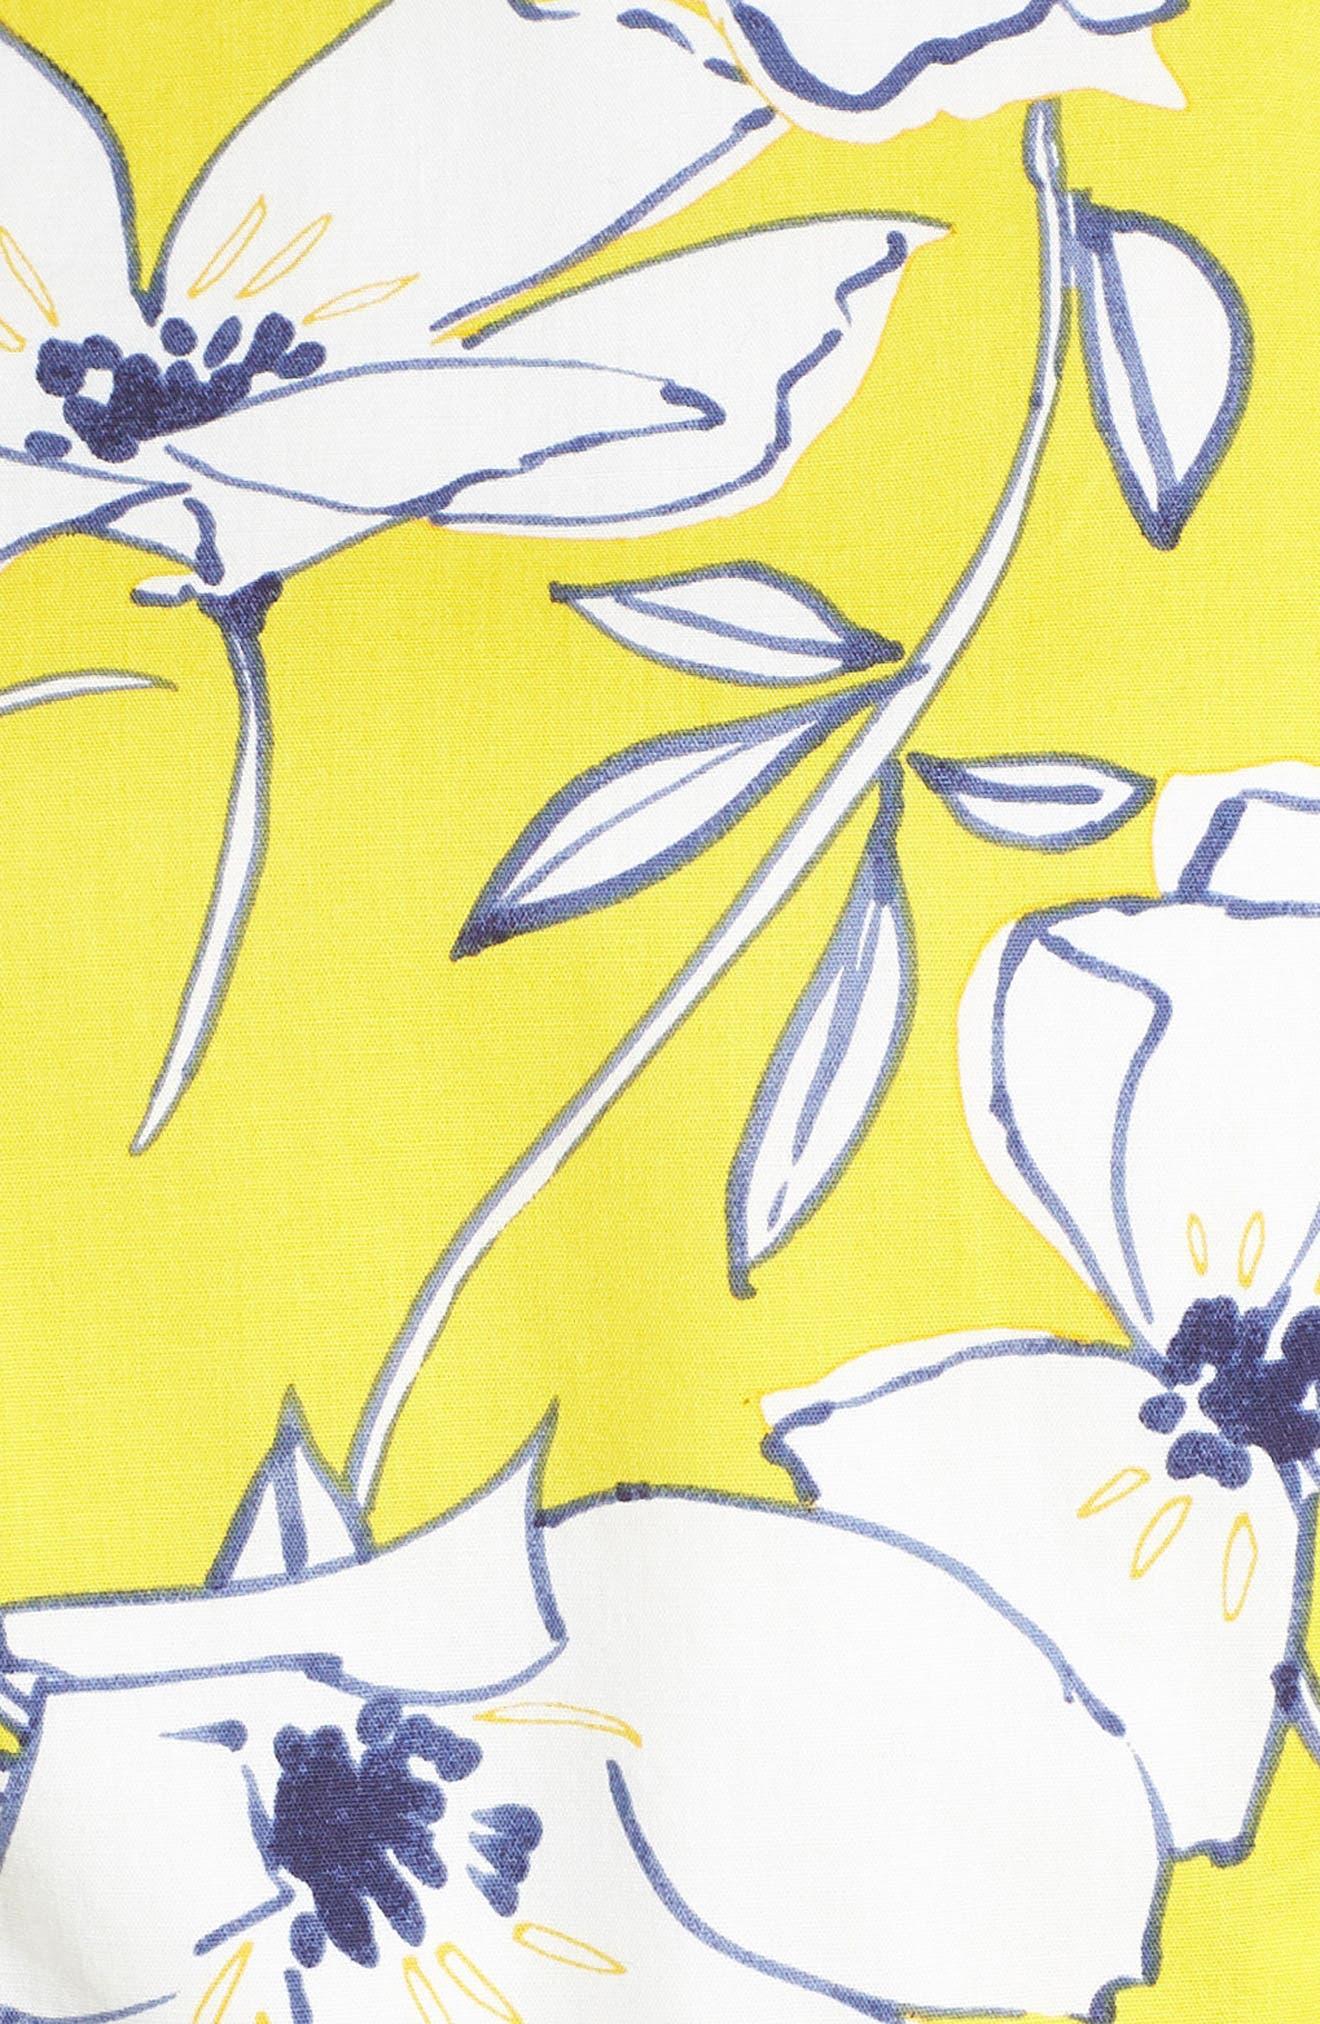 Floral Tie Waist Dress,                             Alternate thumbnail 6, color,                             Yellow/ Navy/ White